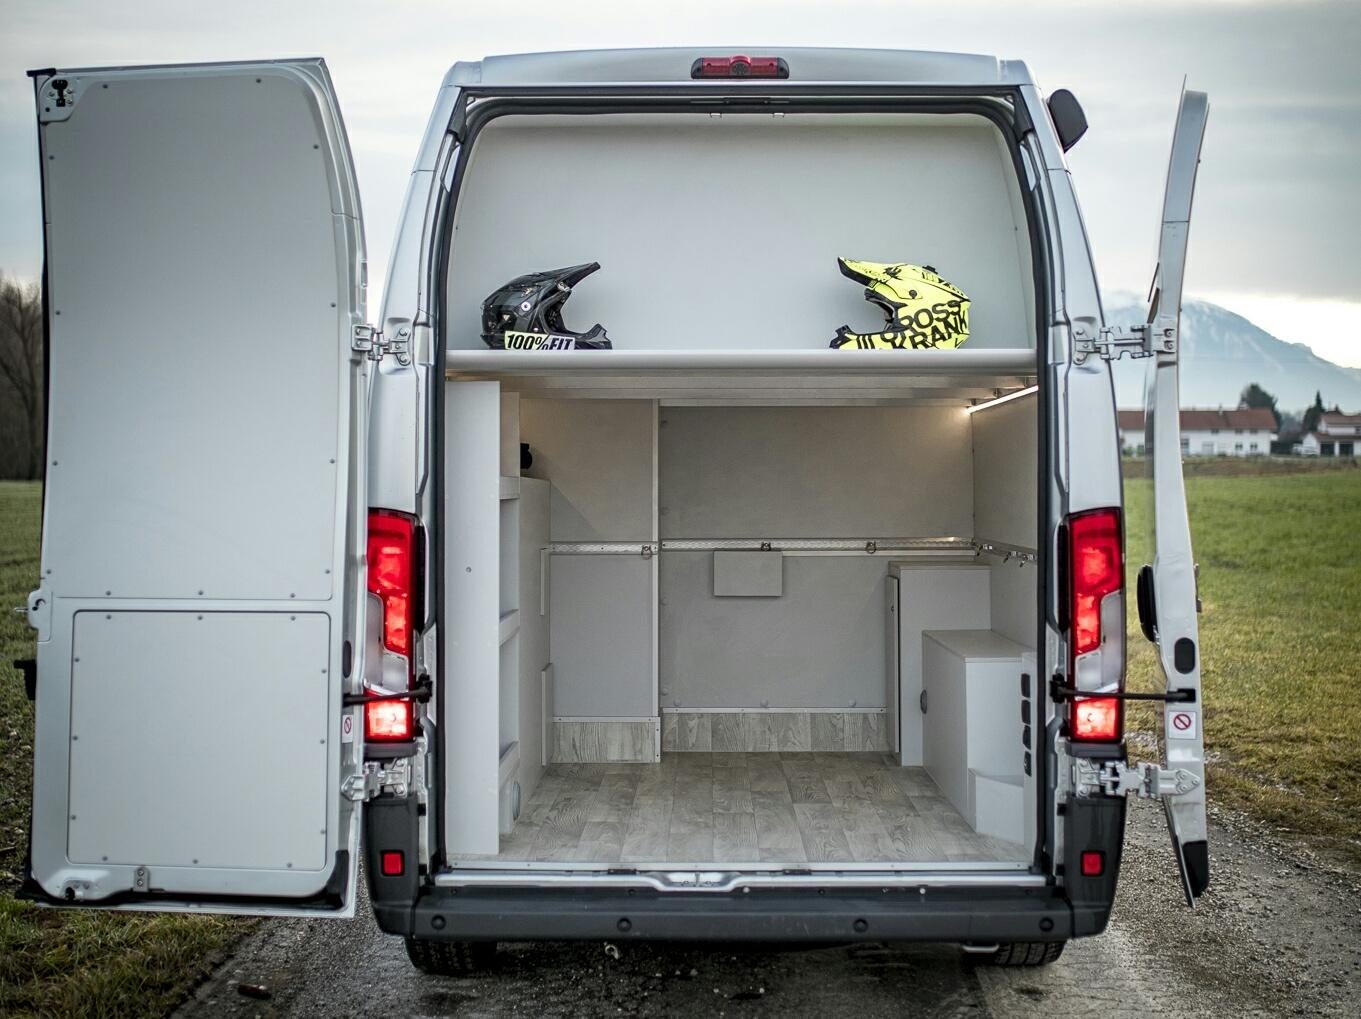 vrm als b rofahrzeug firmenfahrzeug renntransporter vr motorhomes. Black Bedroom Furniture Sets. Home Design Ideas